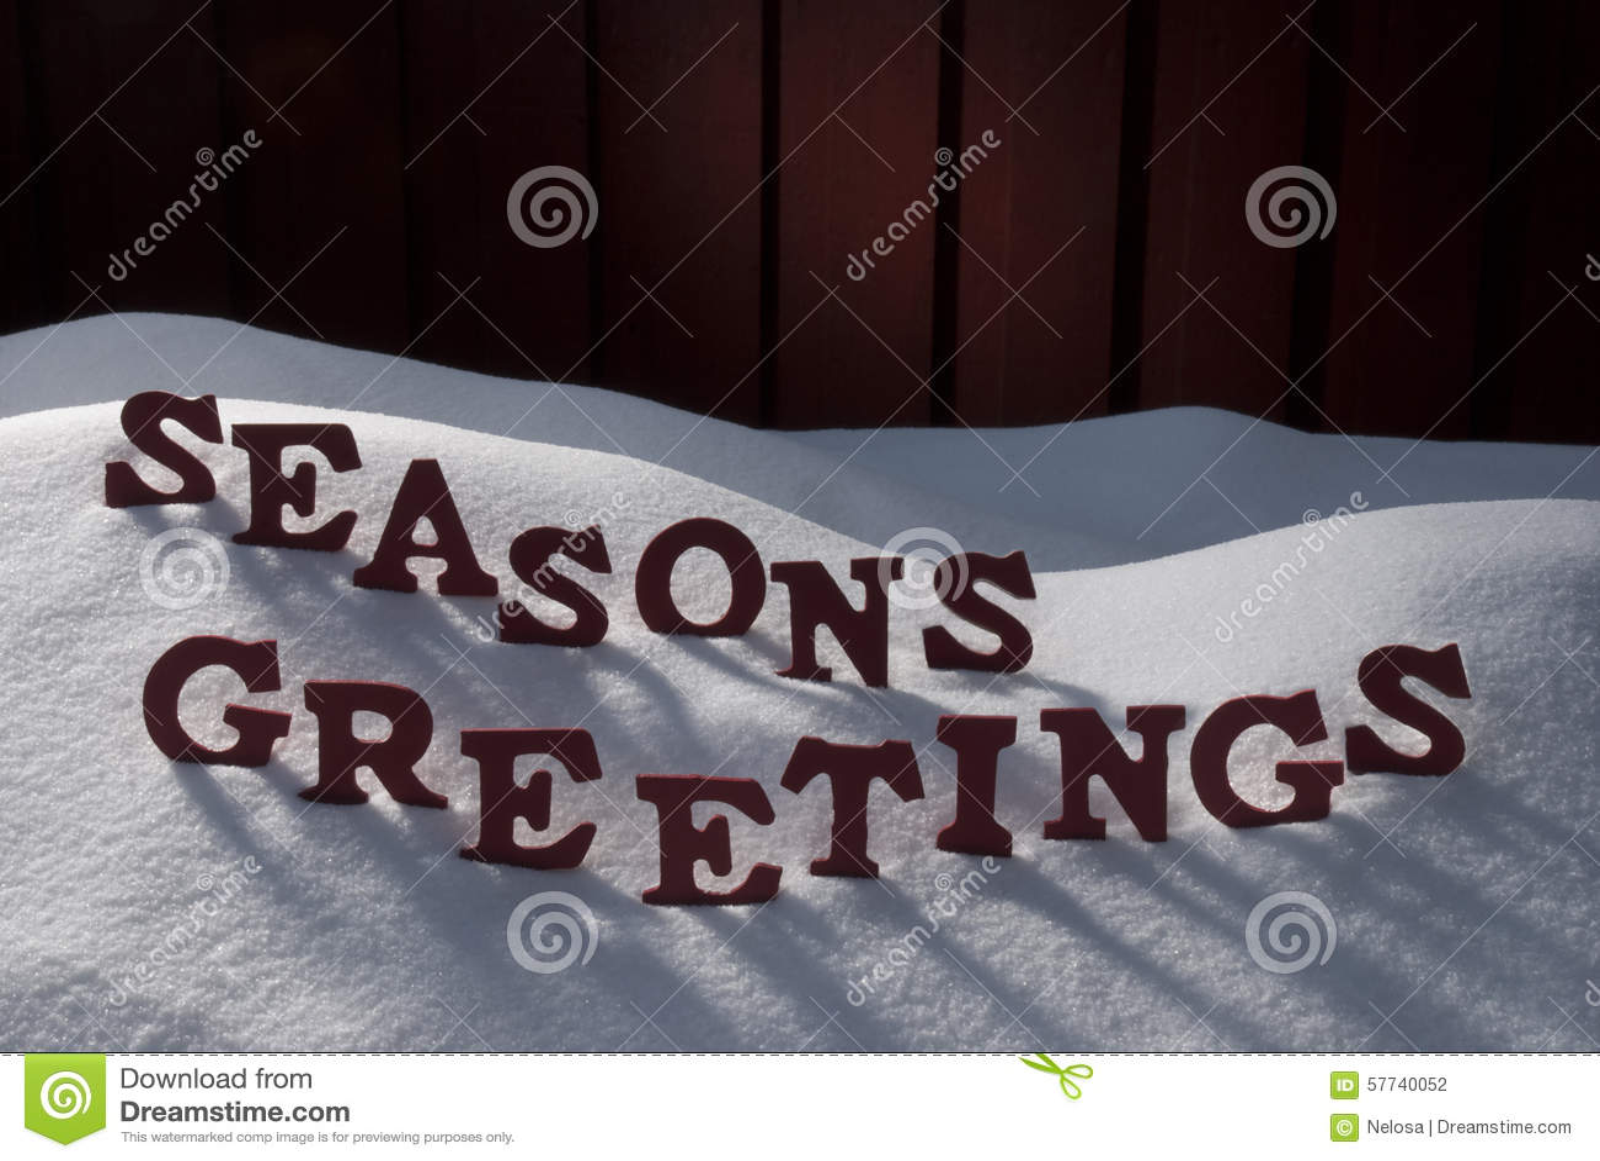 Christmas Word Seasons Greetings On Snow Stock Photo - Image of ...